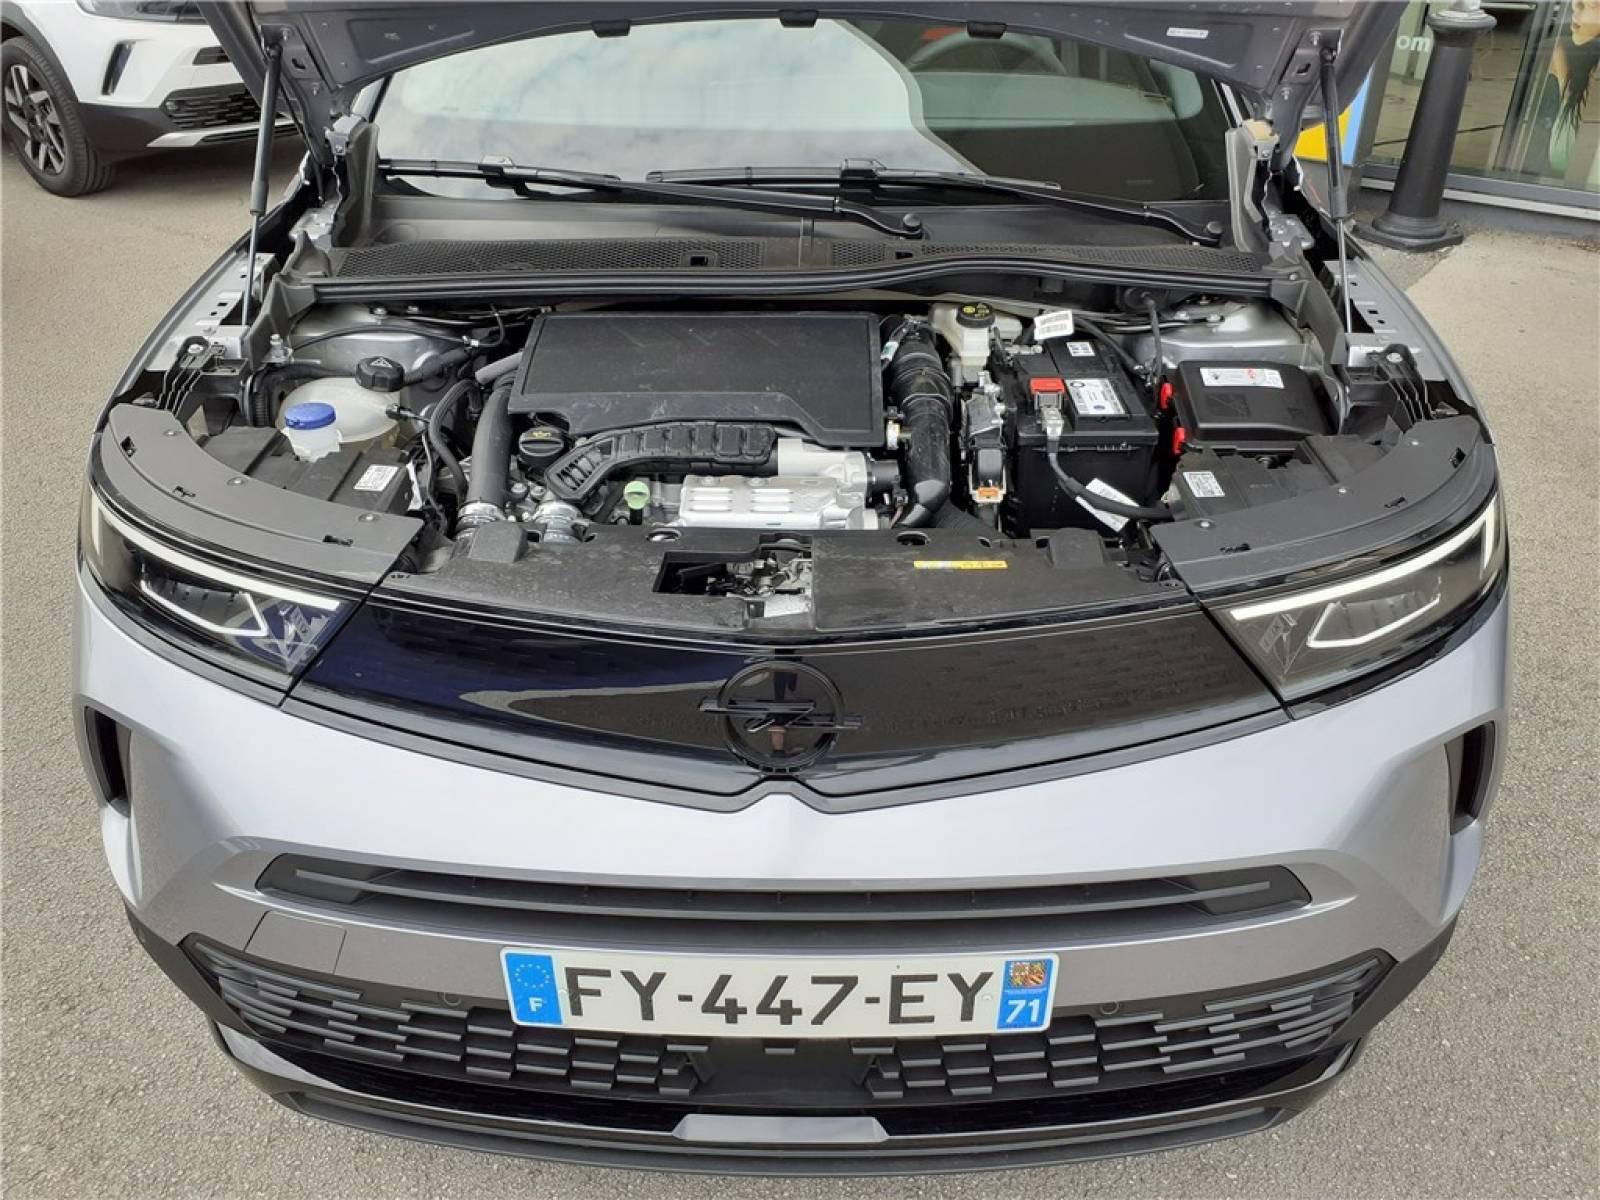 OPEL Mokka 1.2 Turbo 130 ch BVA8 - véhicule d'occasion - Groupe Guillet - Opel Magicauto - Chalon-sur-Saône - 71380 - Saint-Marcel - 12